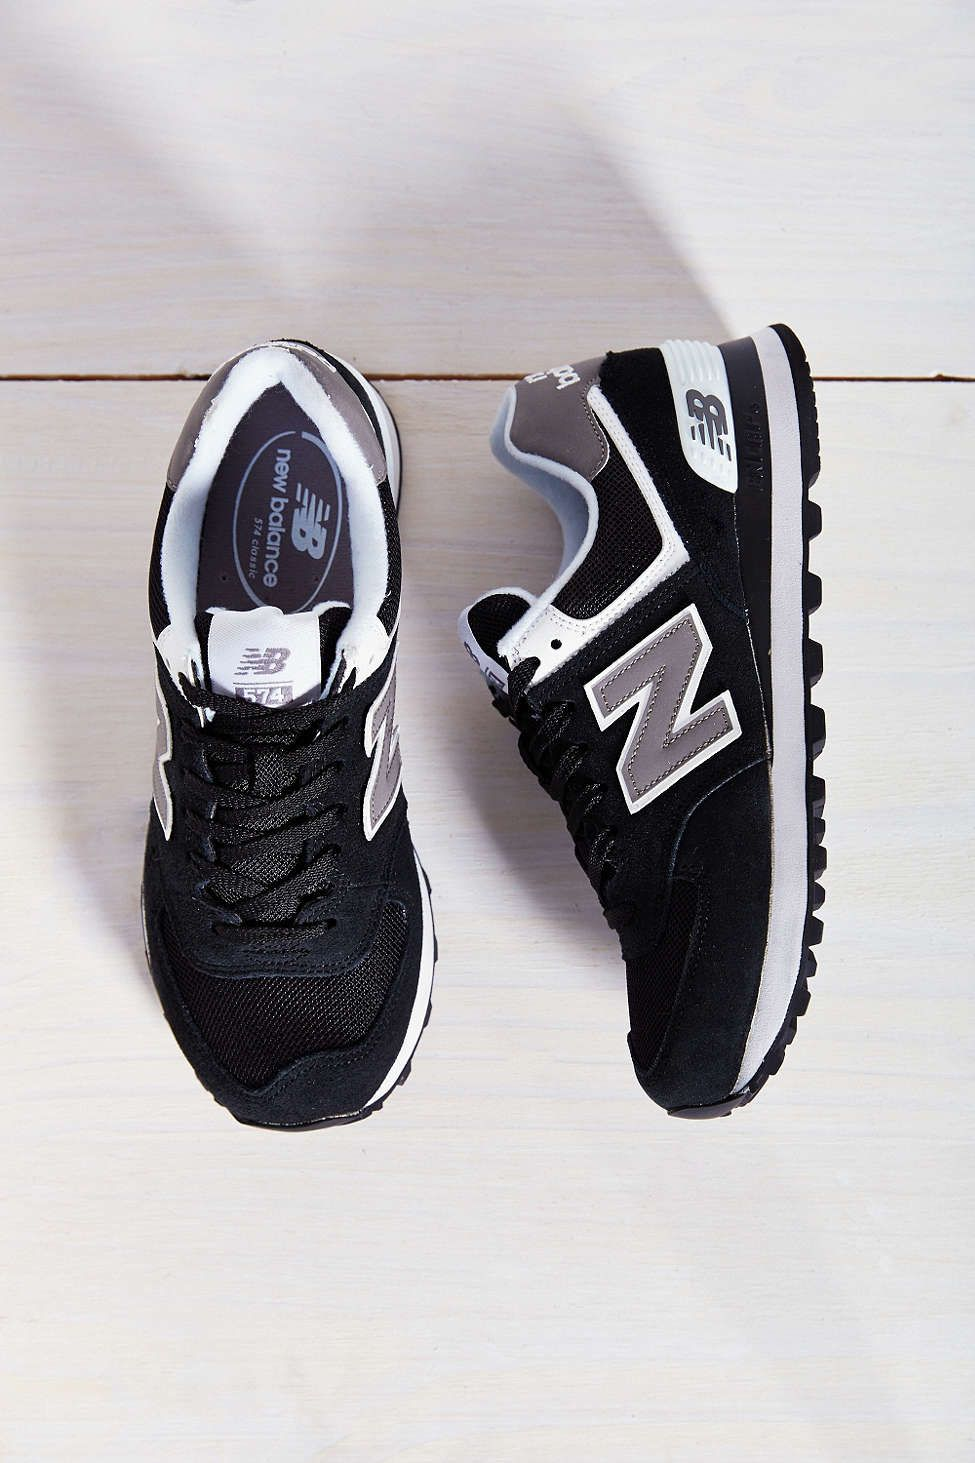 New Balance 574 Classic Running Sneaker Urban Outfitters New Balance Shoes Running Sneakers Sneakers Fashion